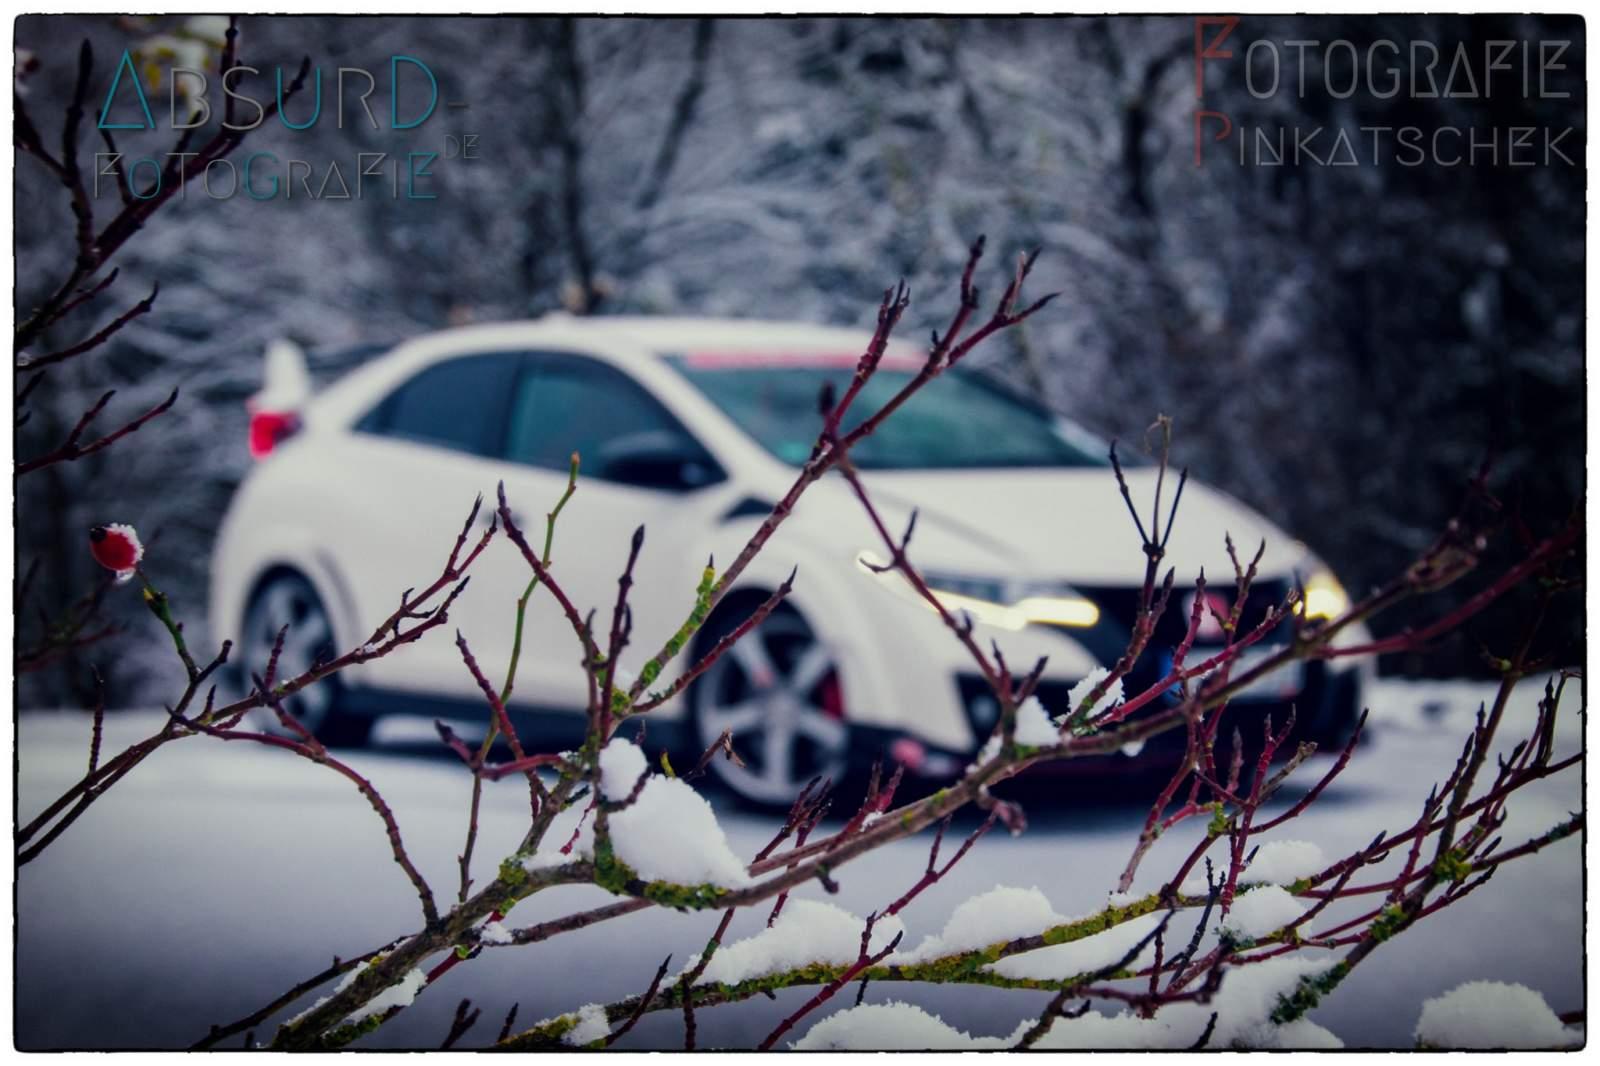 honda-civic-typer-fkr-nuerburgring-schnee - DSC09218u70_tn_tn.jpg